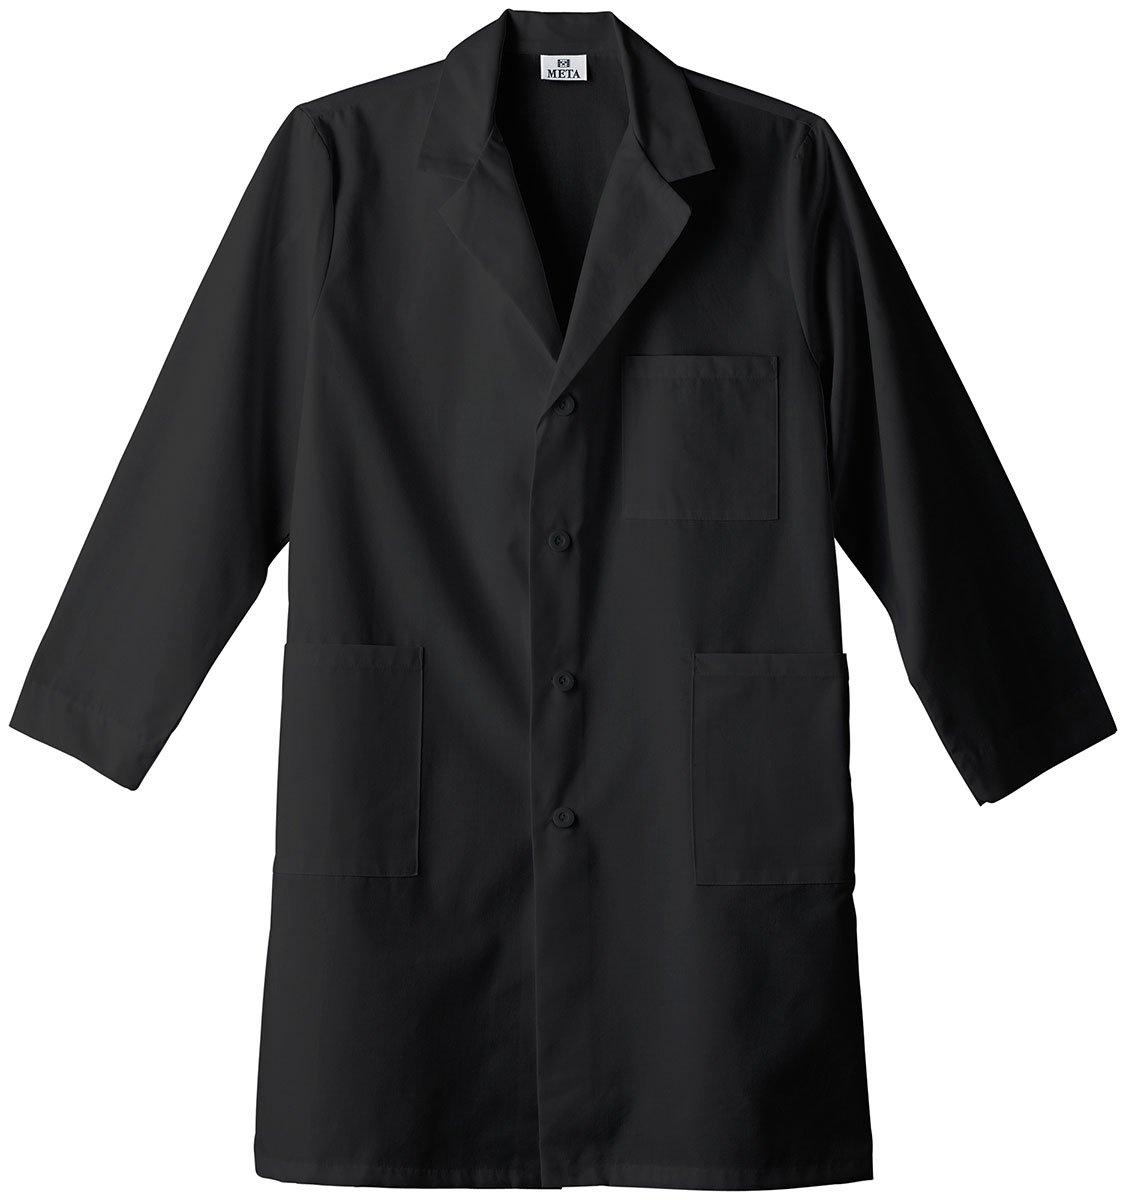 Meta LabWear Unisex Colored 40''; Lab Coat XXXXX-Large Black